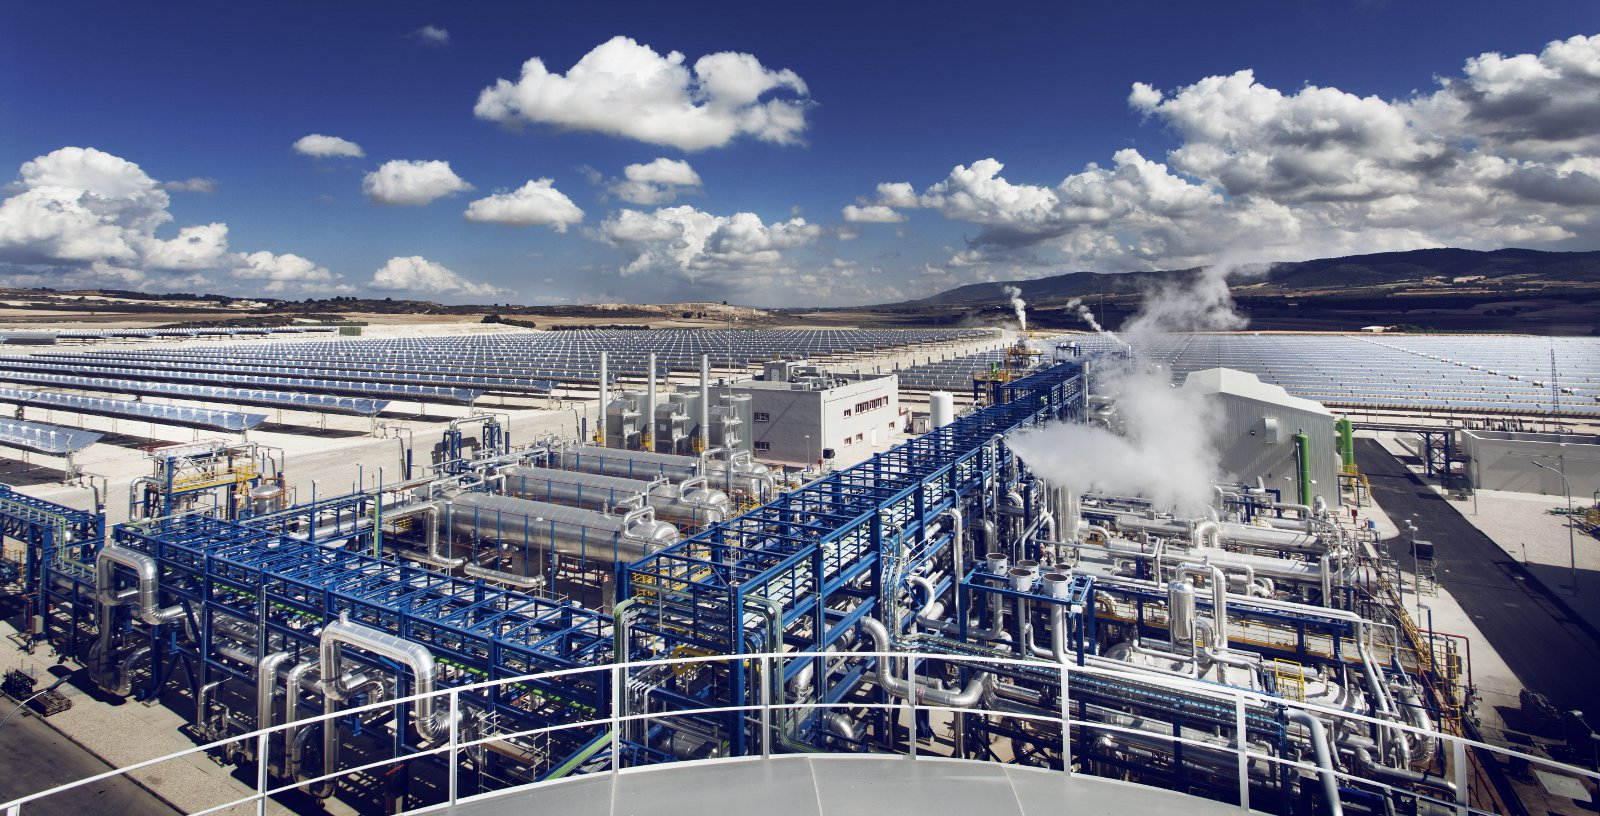 FCC_ENERSTAR_VILLENA_Thermosolar_power_plant_01_Idom